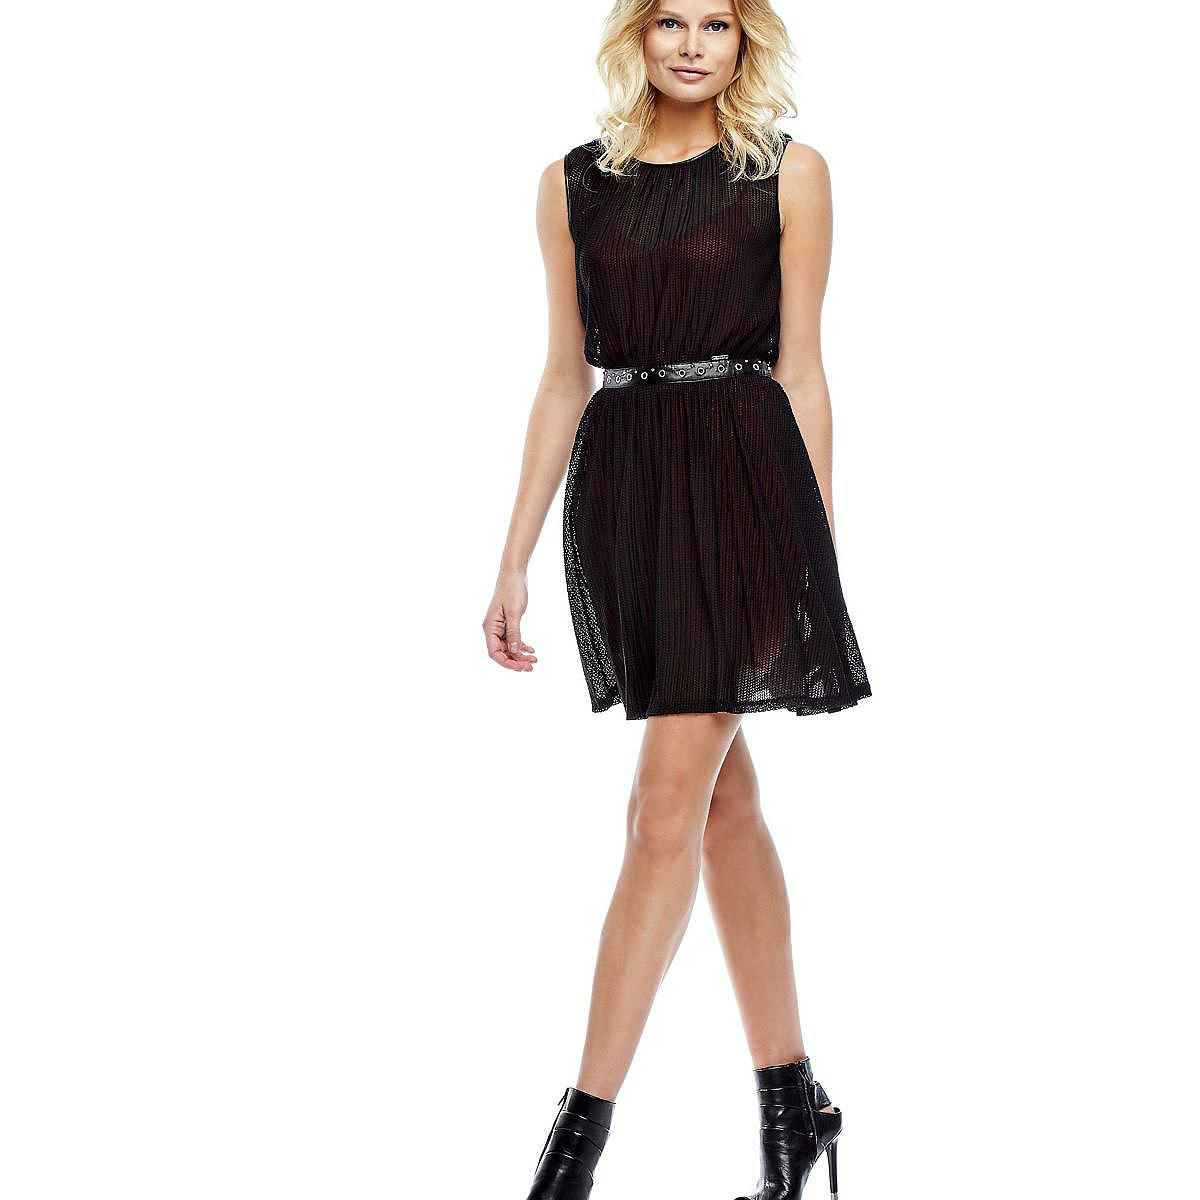 Guess jurk met ajourmotief zwart